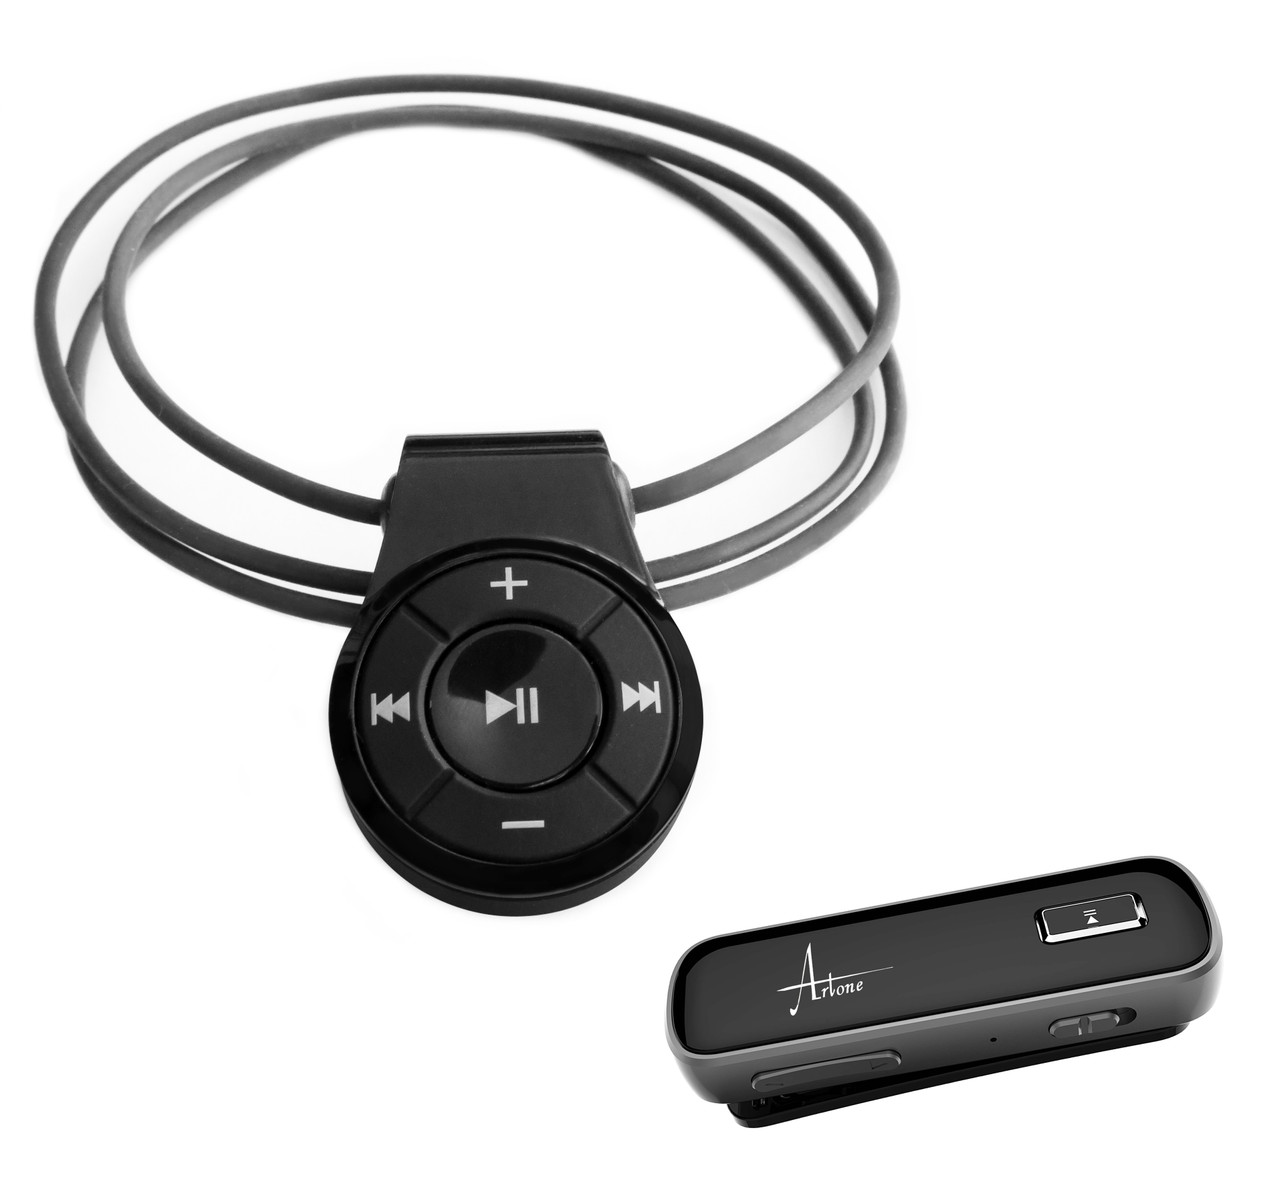 Artone 3 MAXC Inductive Bluetooth Neckloop and Mic Combo